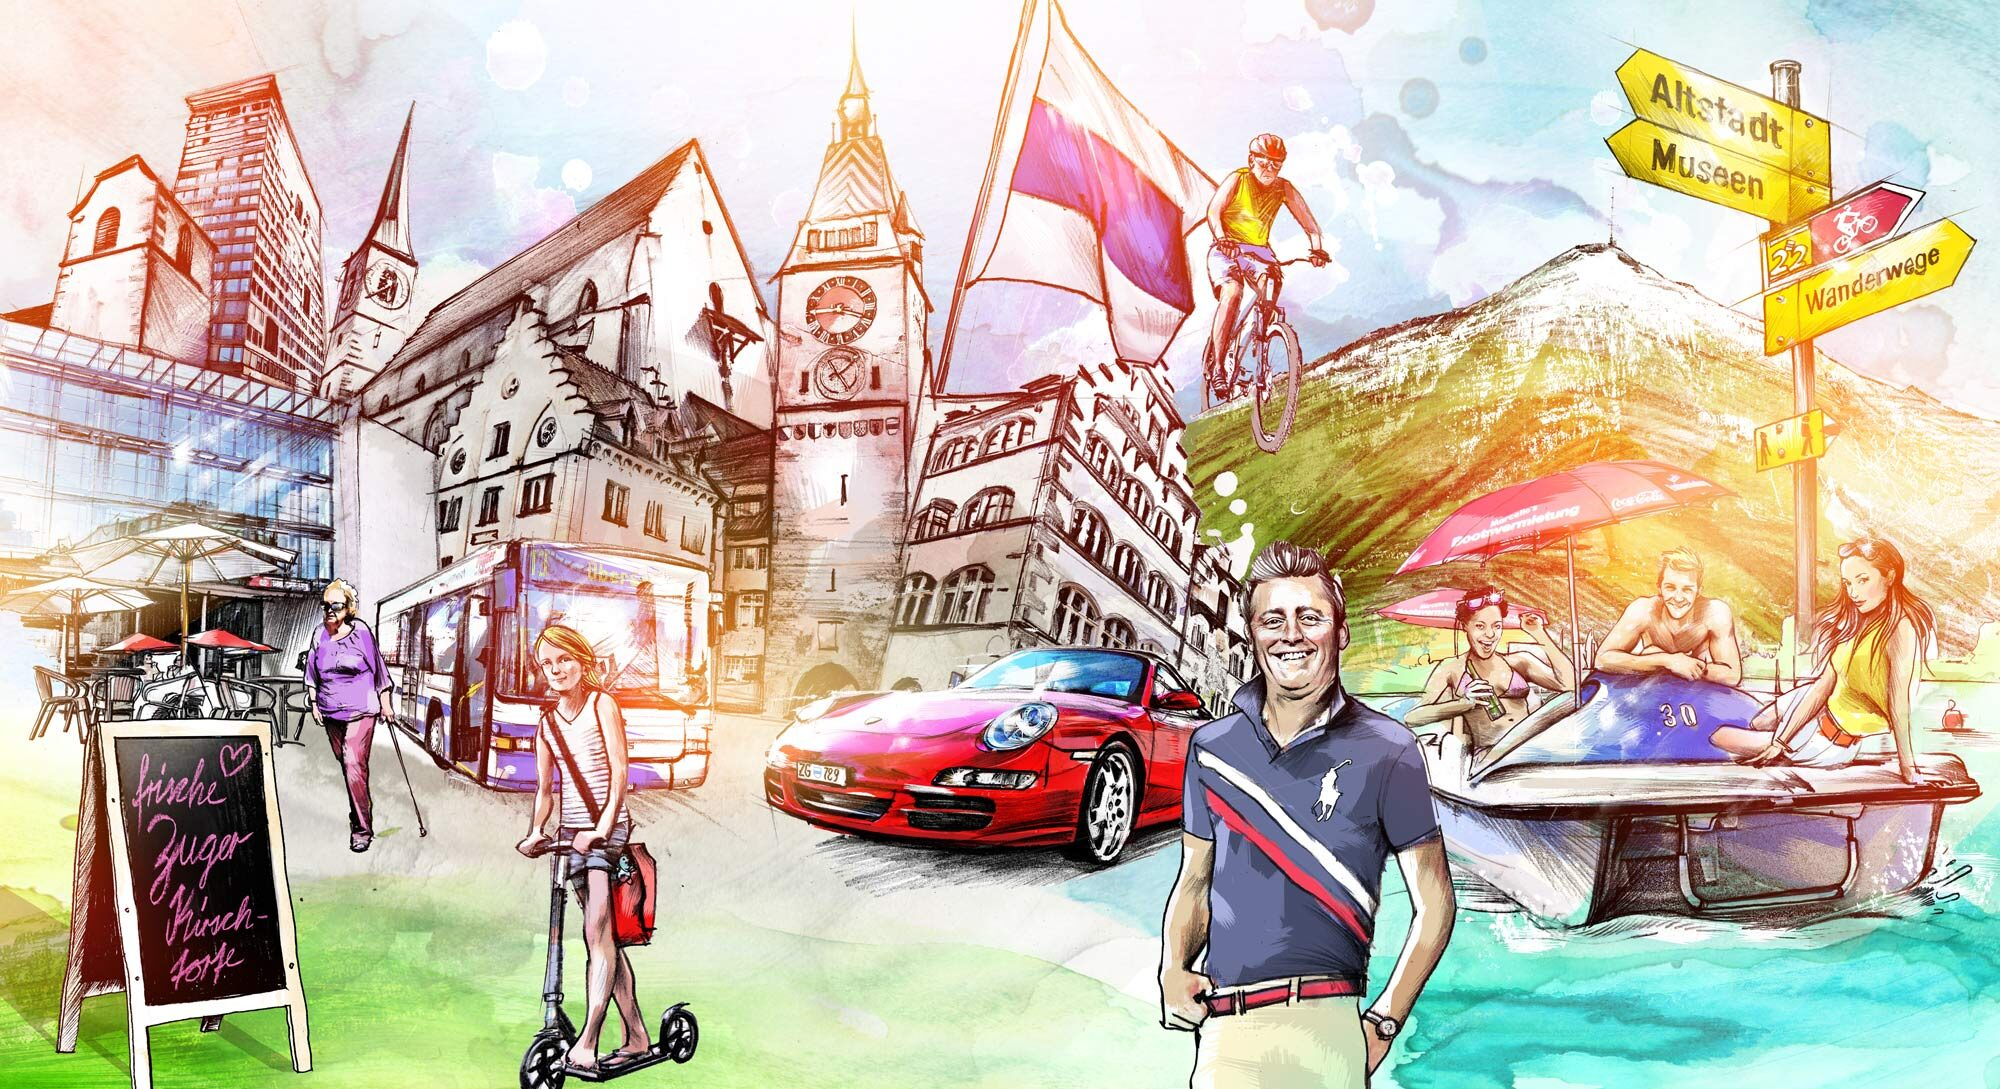 Zug Aufmacher - Kornel Illustration | Kornel Stadler portfolio